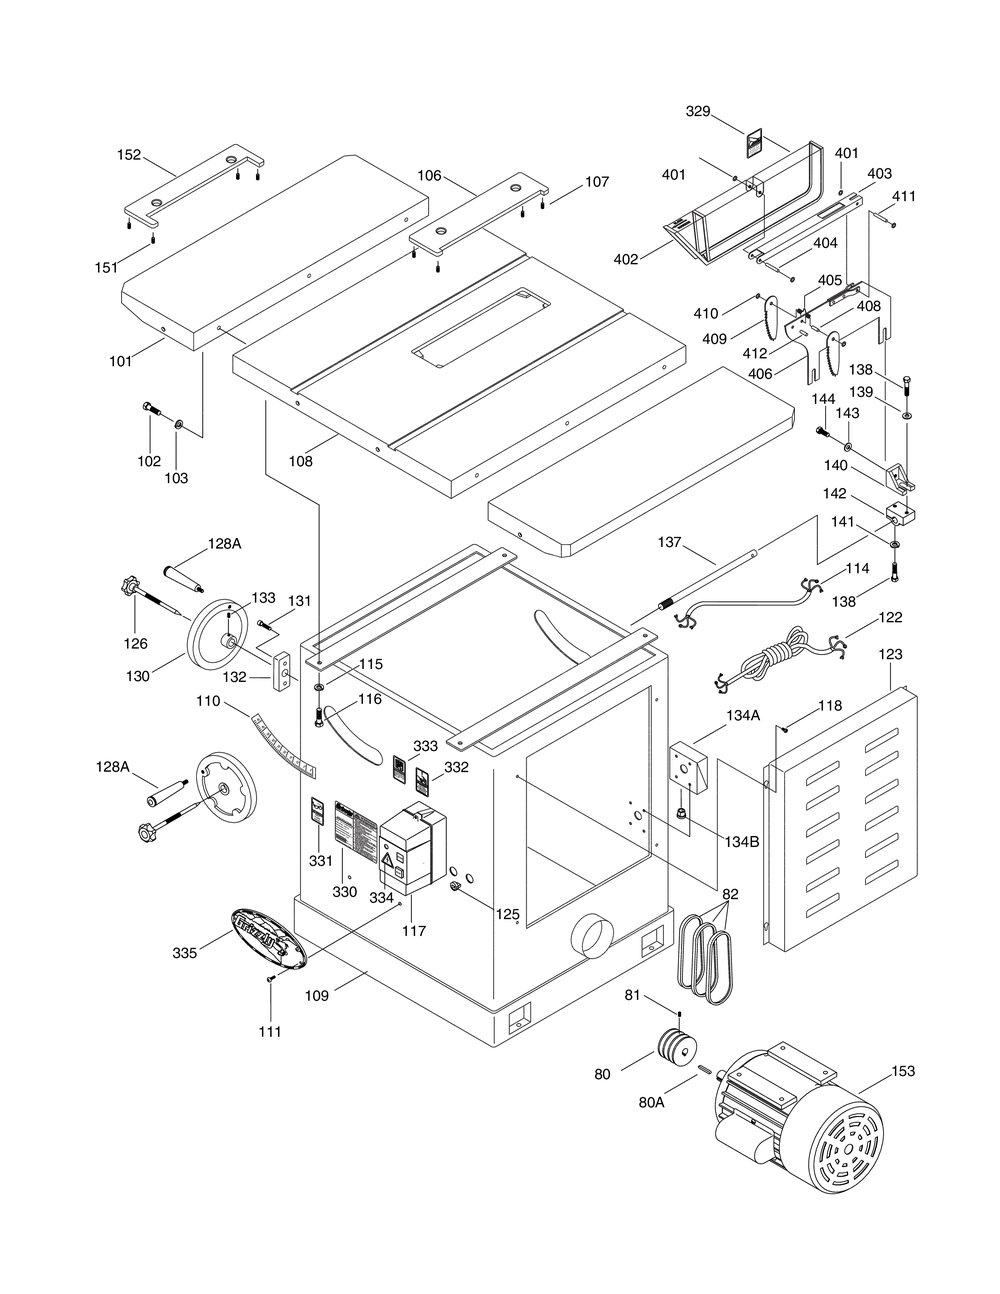 Sanyo Model14795010 Wiring Diagram Elkay Parts Diagram